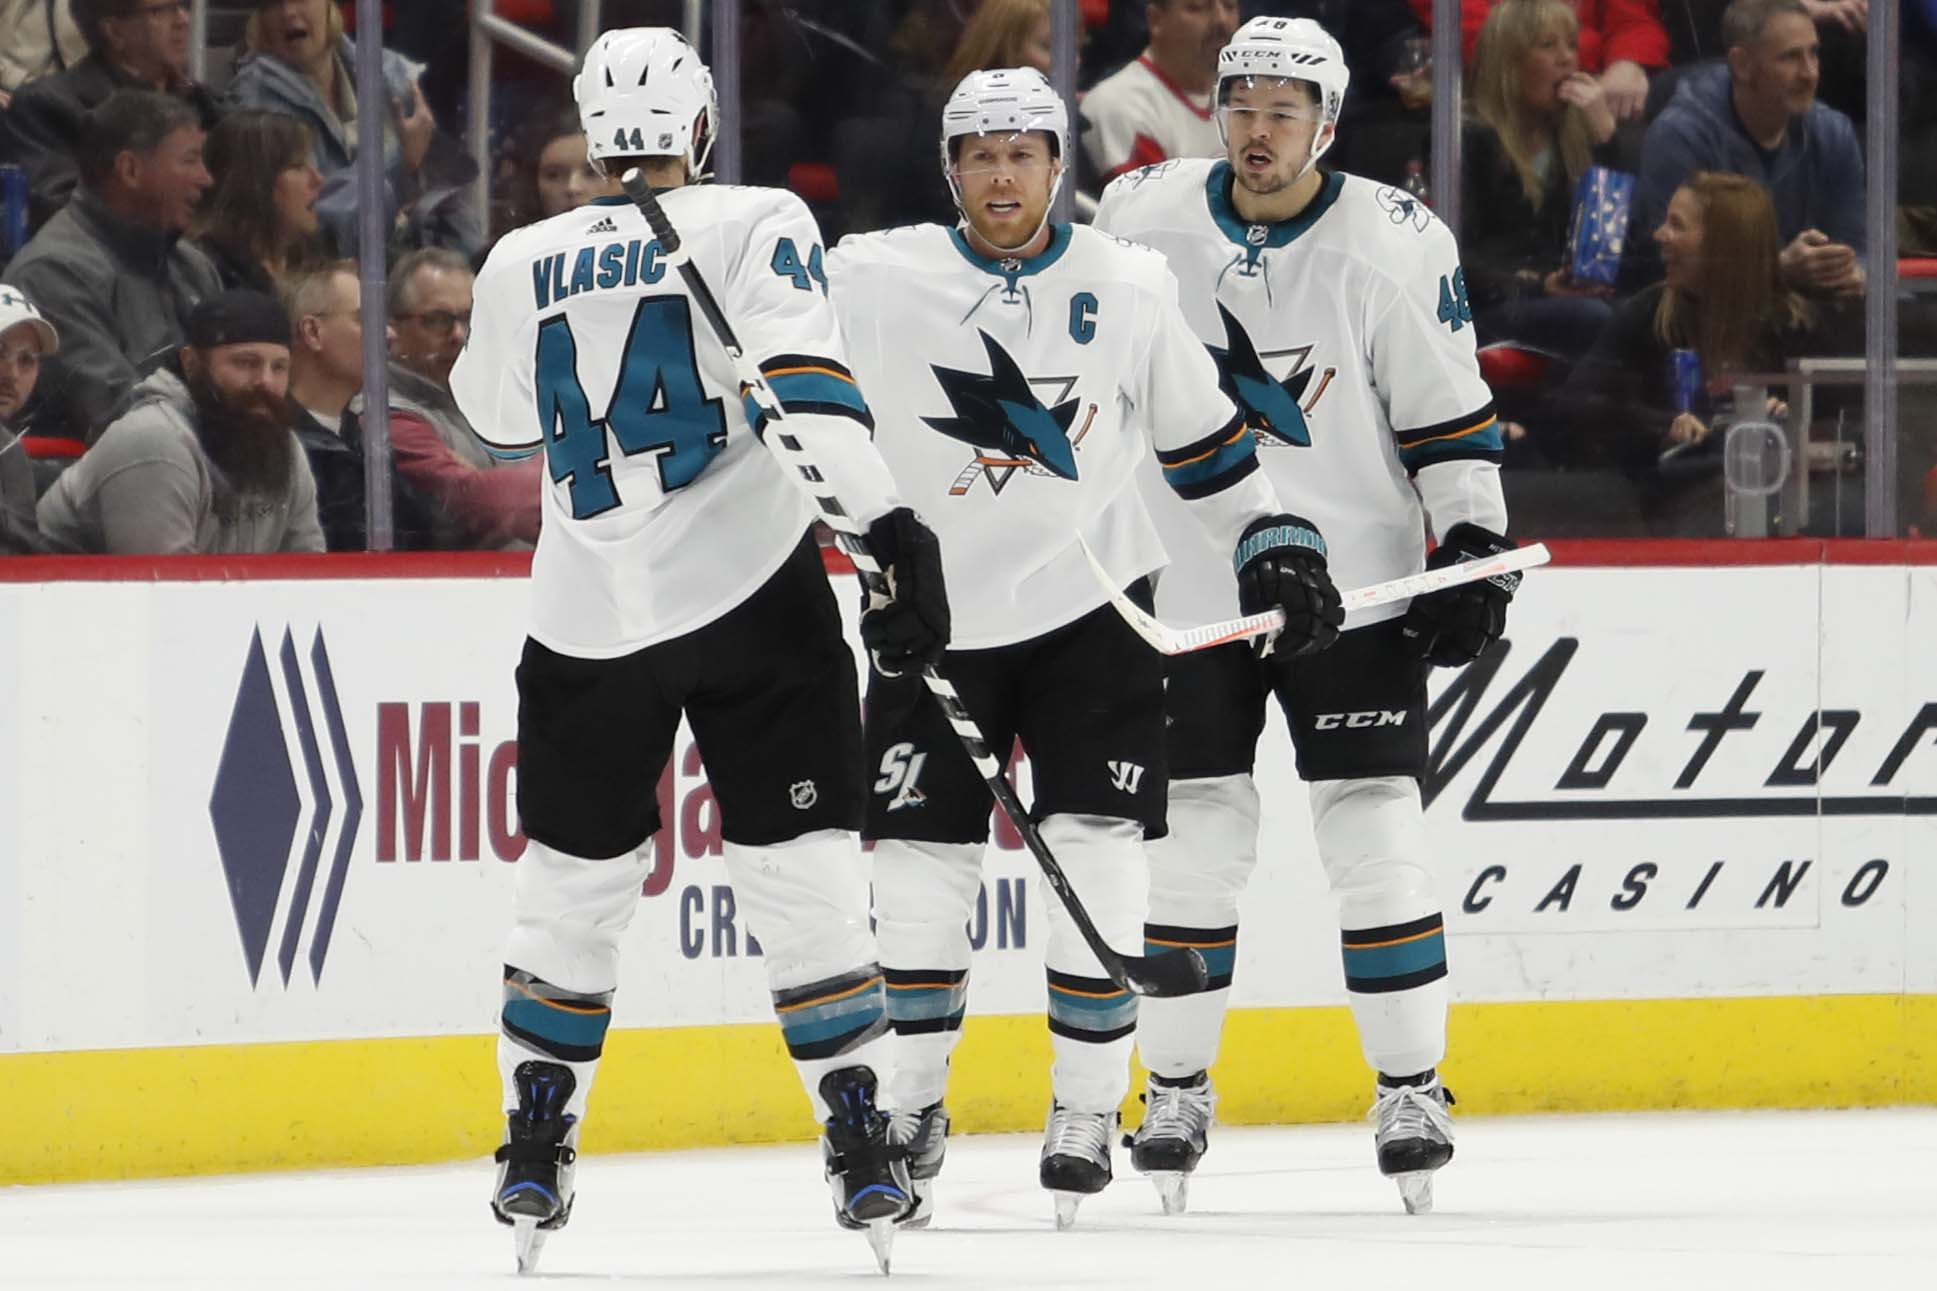 NHL: San Jose Sharks at Detroit Red Wings